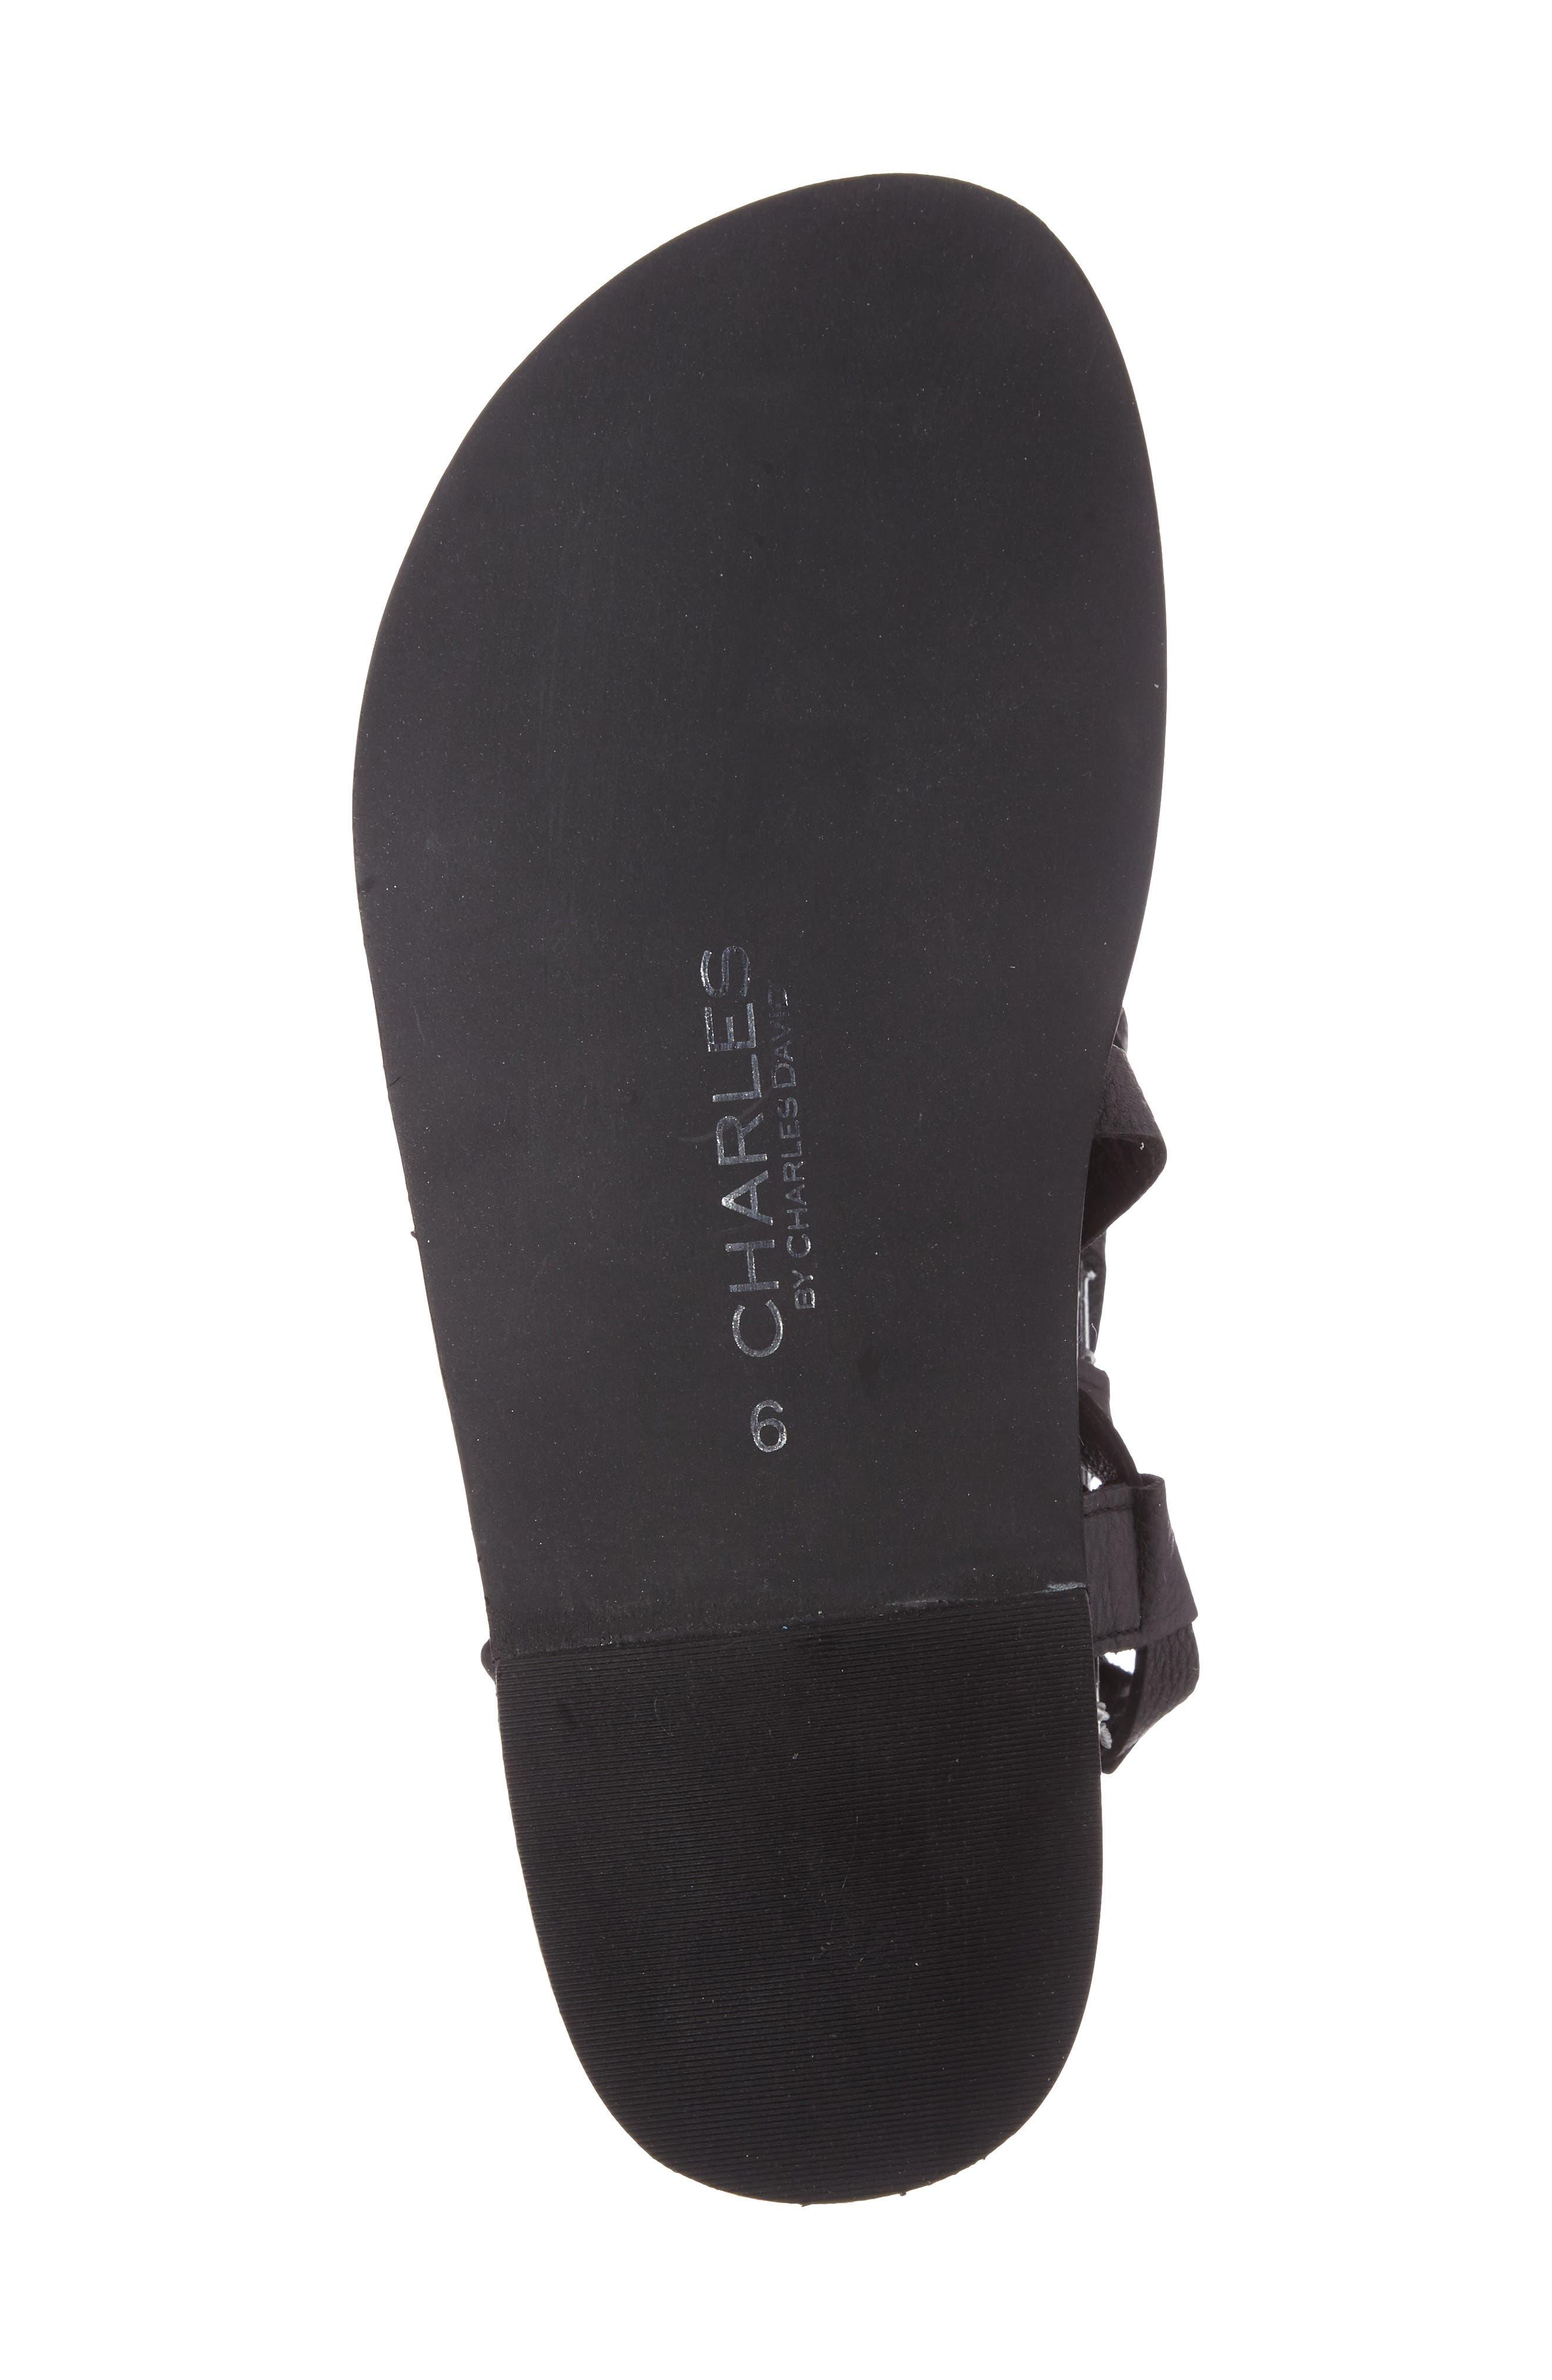 Steeler Ankle Wrap Sandal,                             Alternate thumbnail 4, color,                             001